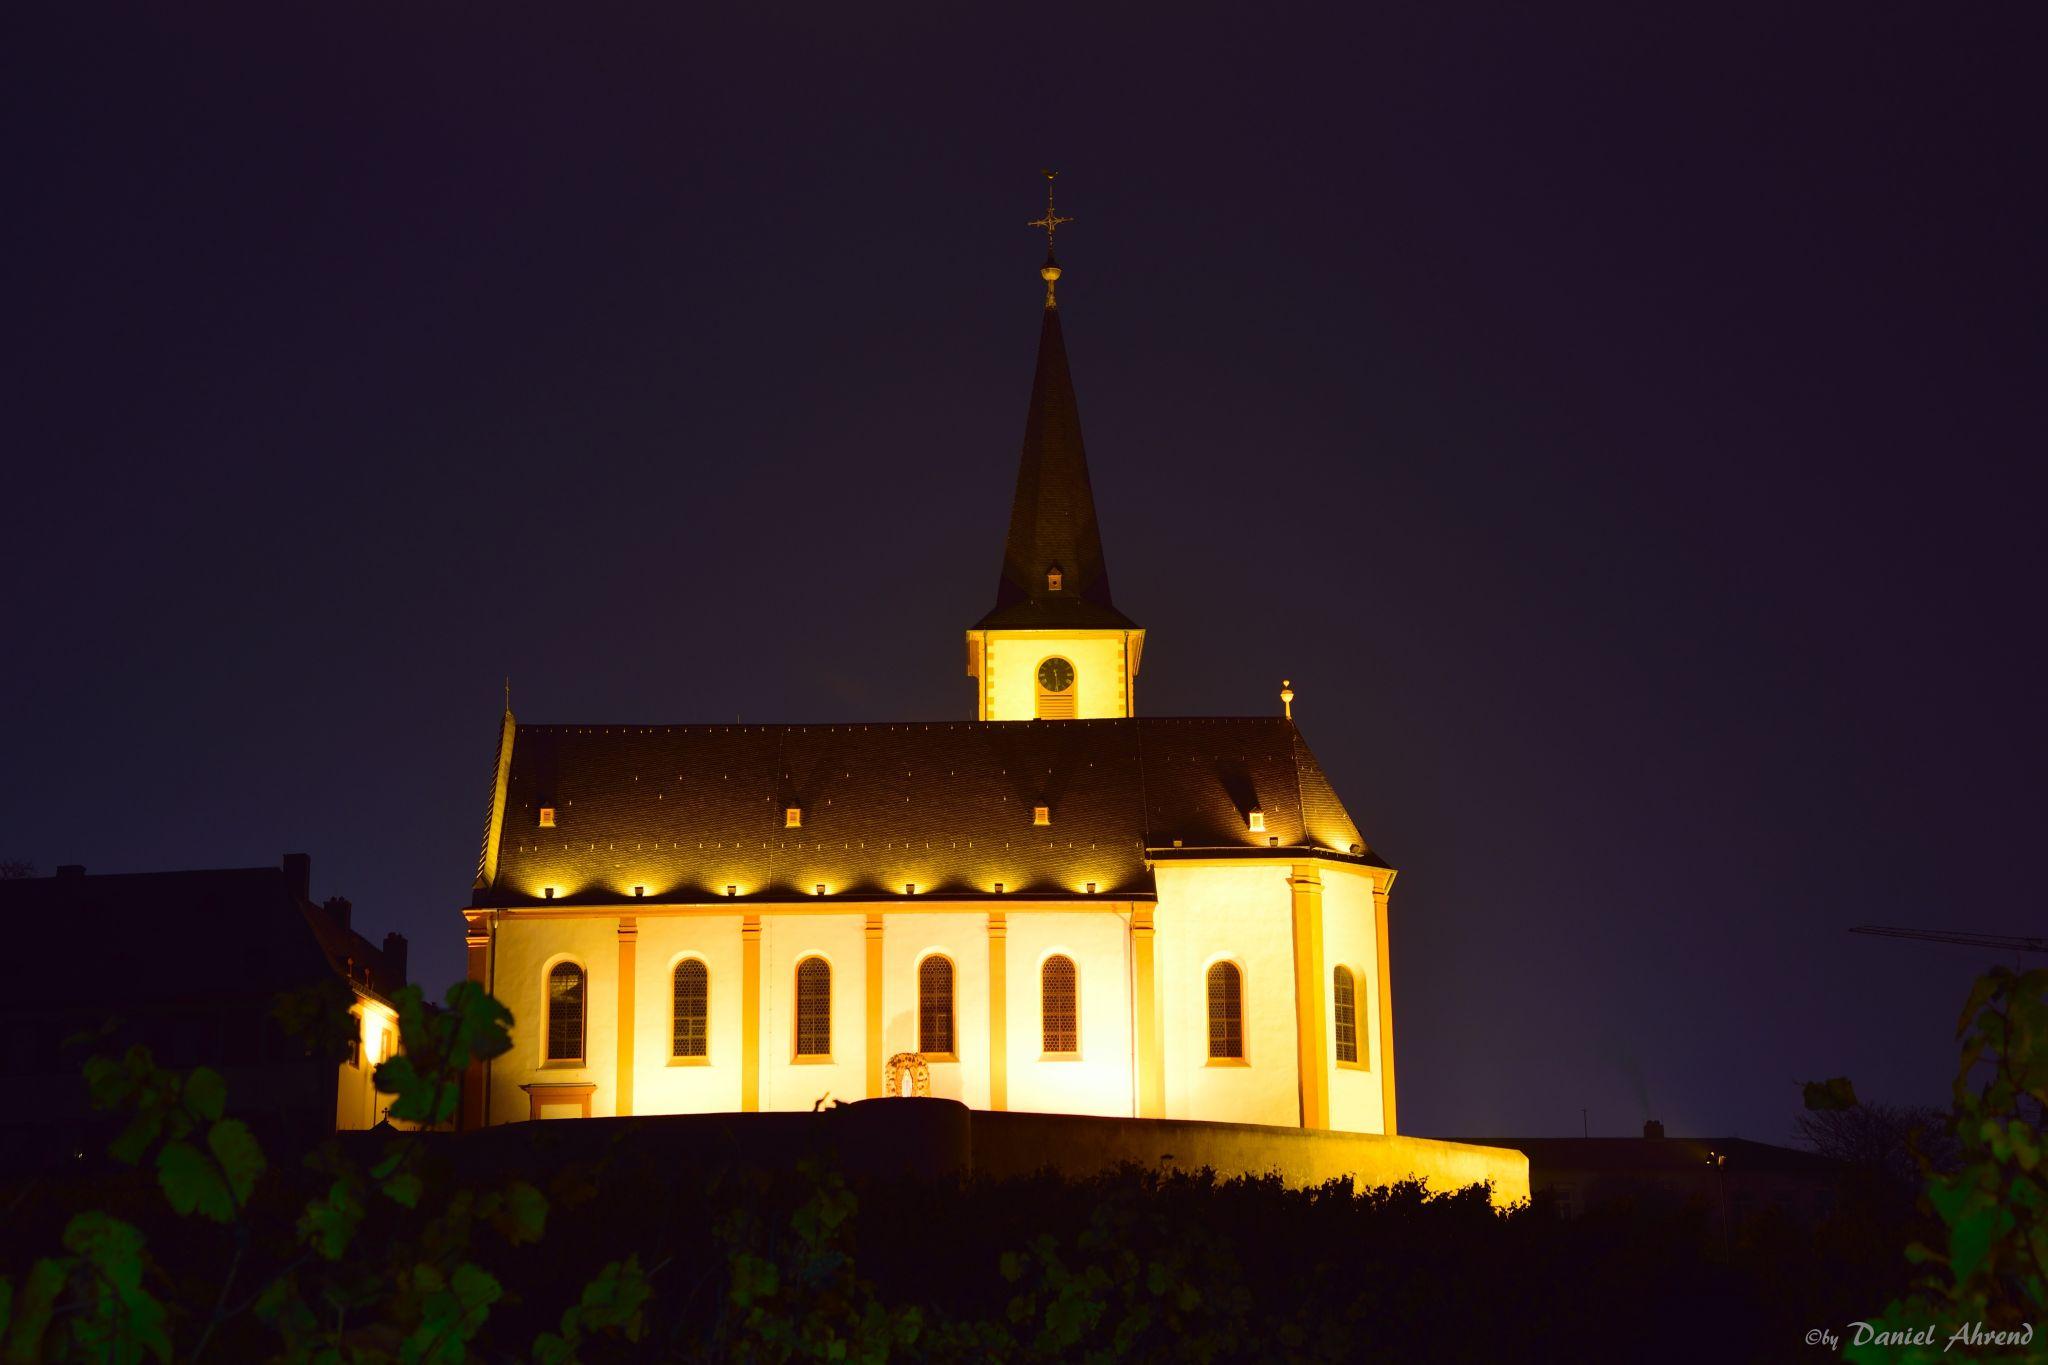 Sankt Peter und Paul (Hochheim am Main), Germany